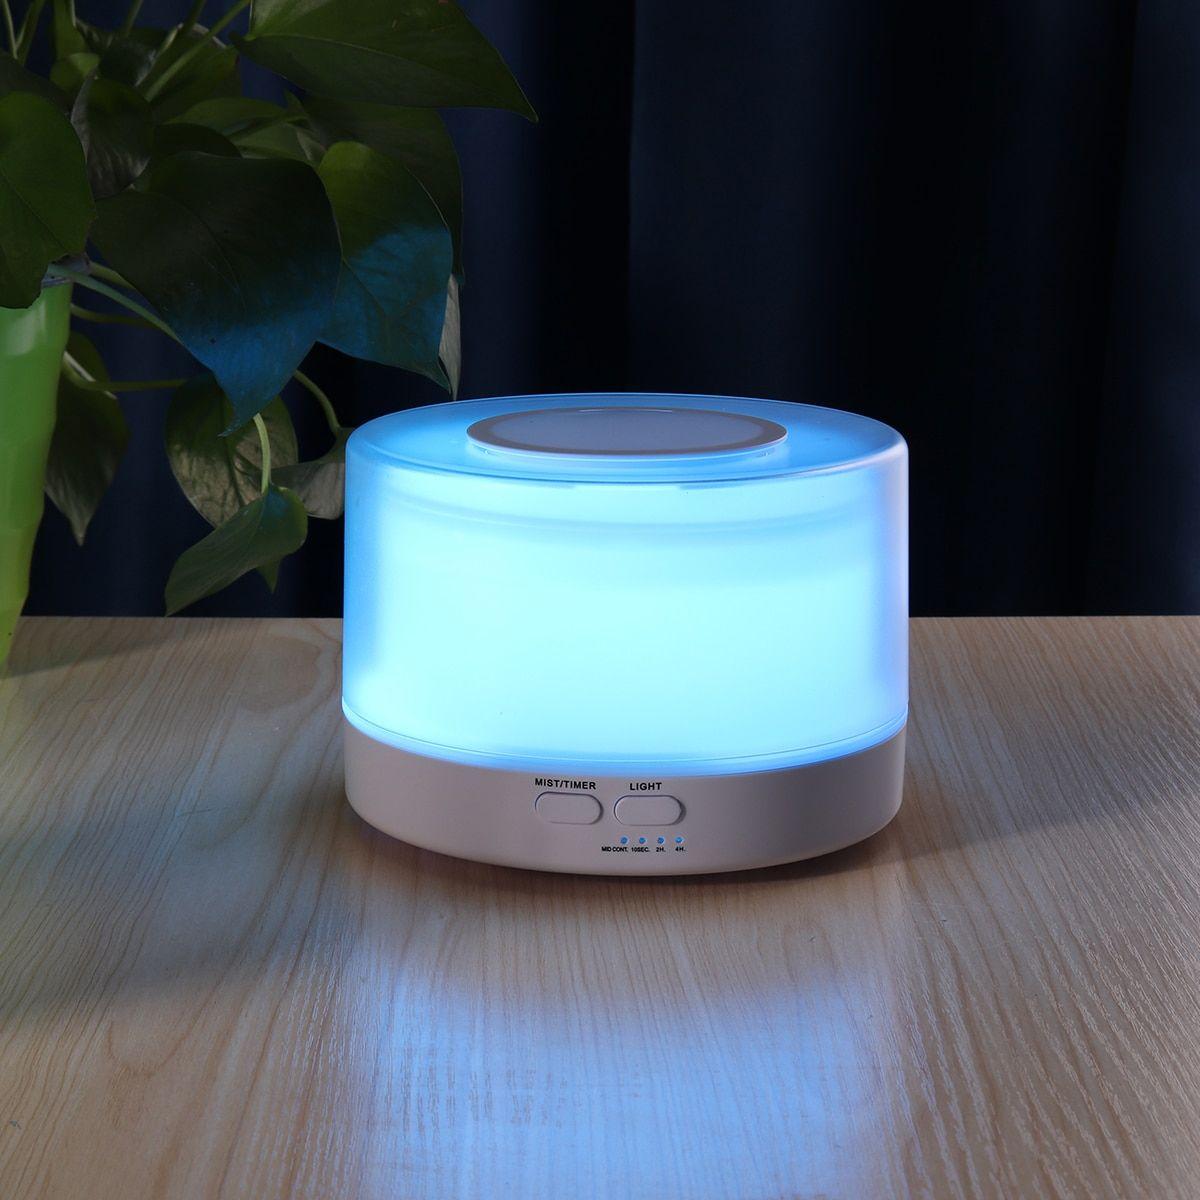 700Ml Water Tank Ultrasonic Humidifier Aroma LED Oil